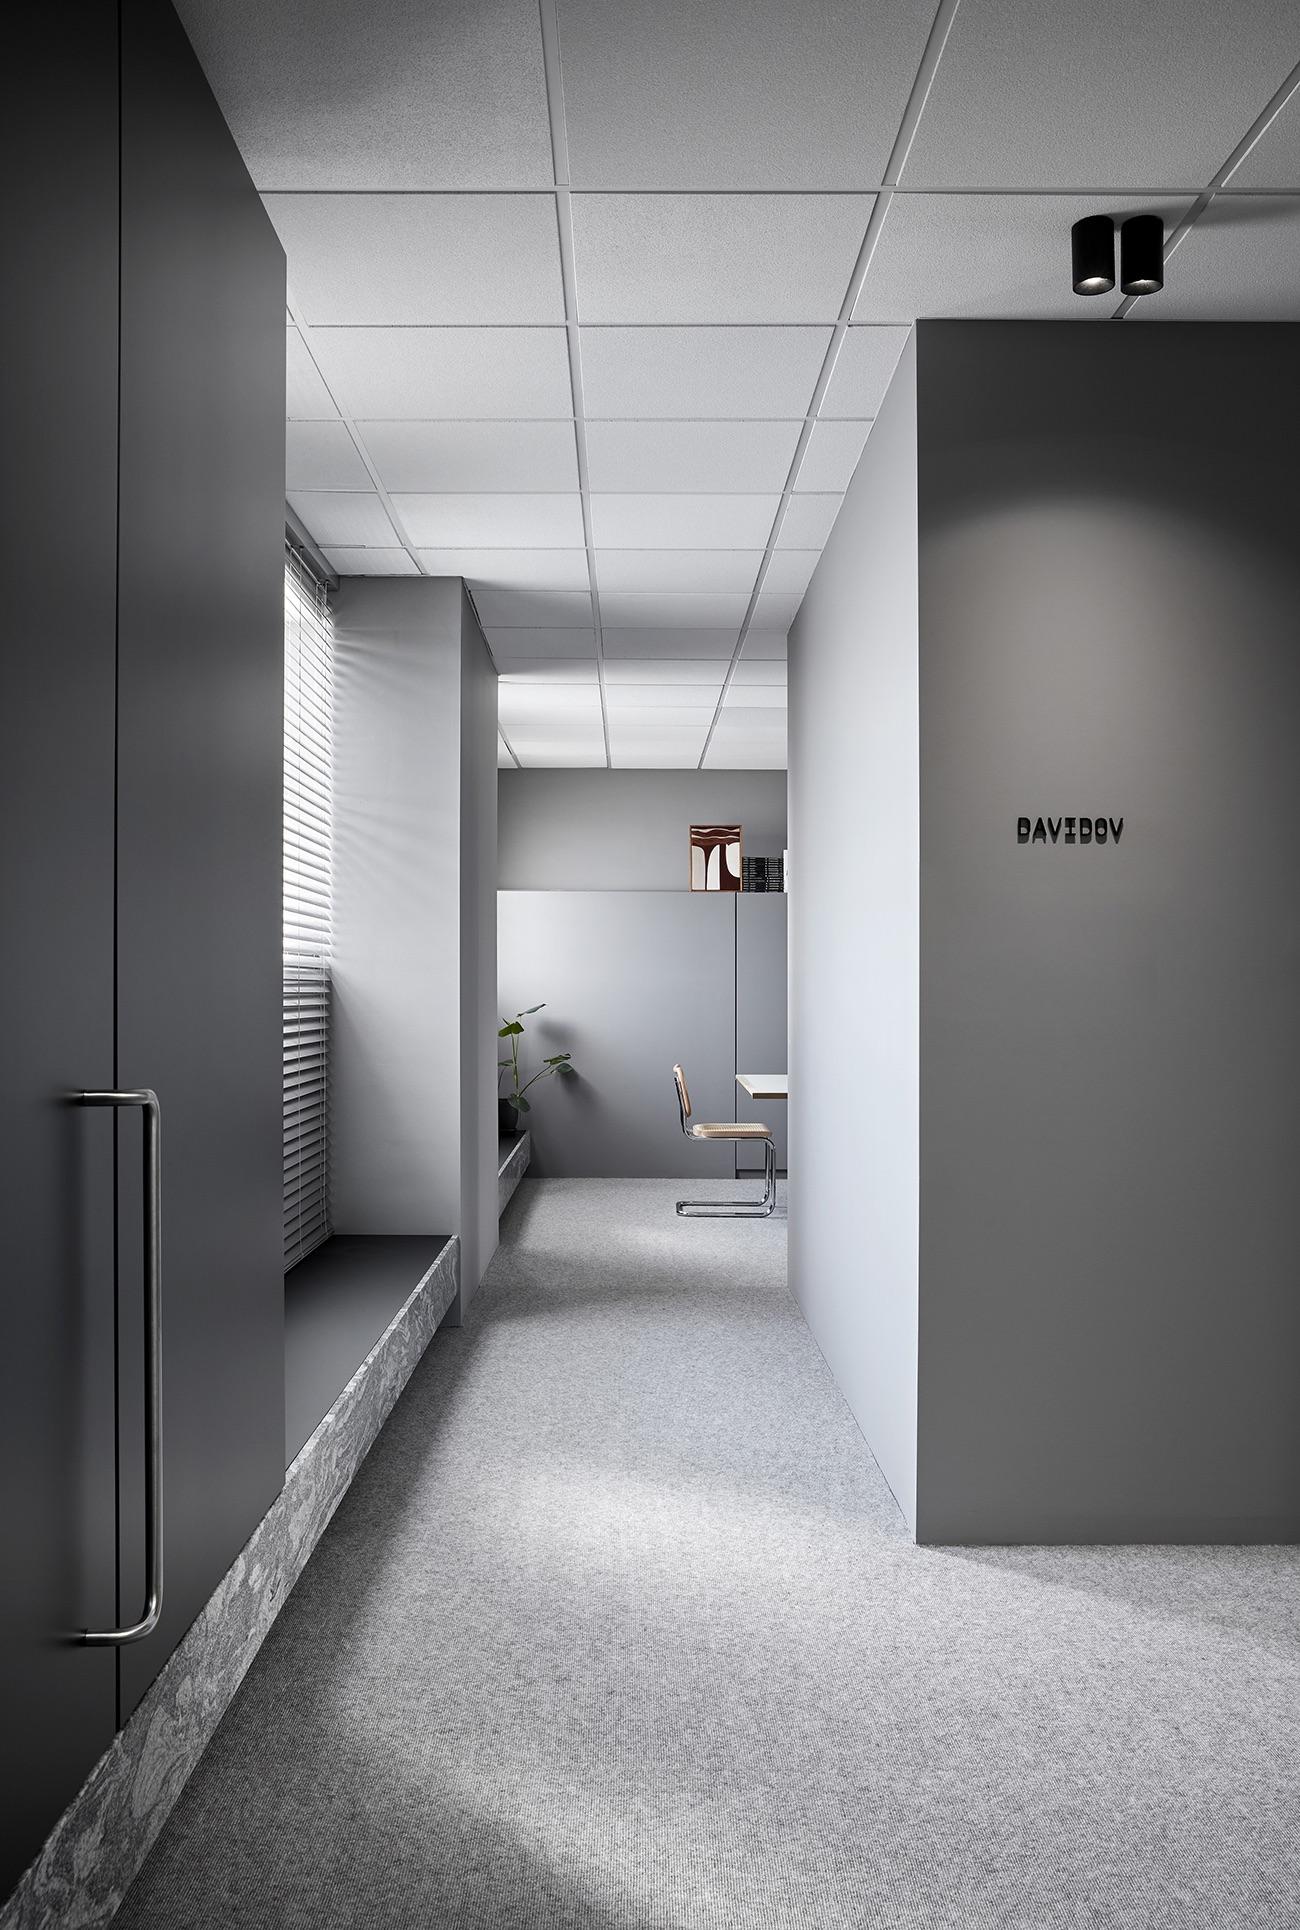 davidov-architects-studio-office-14